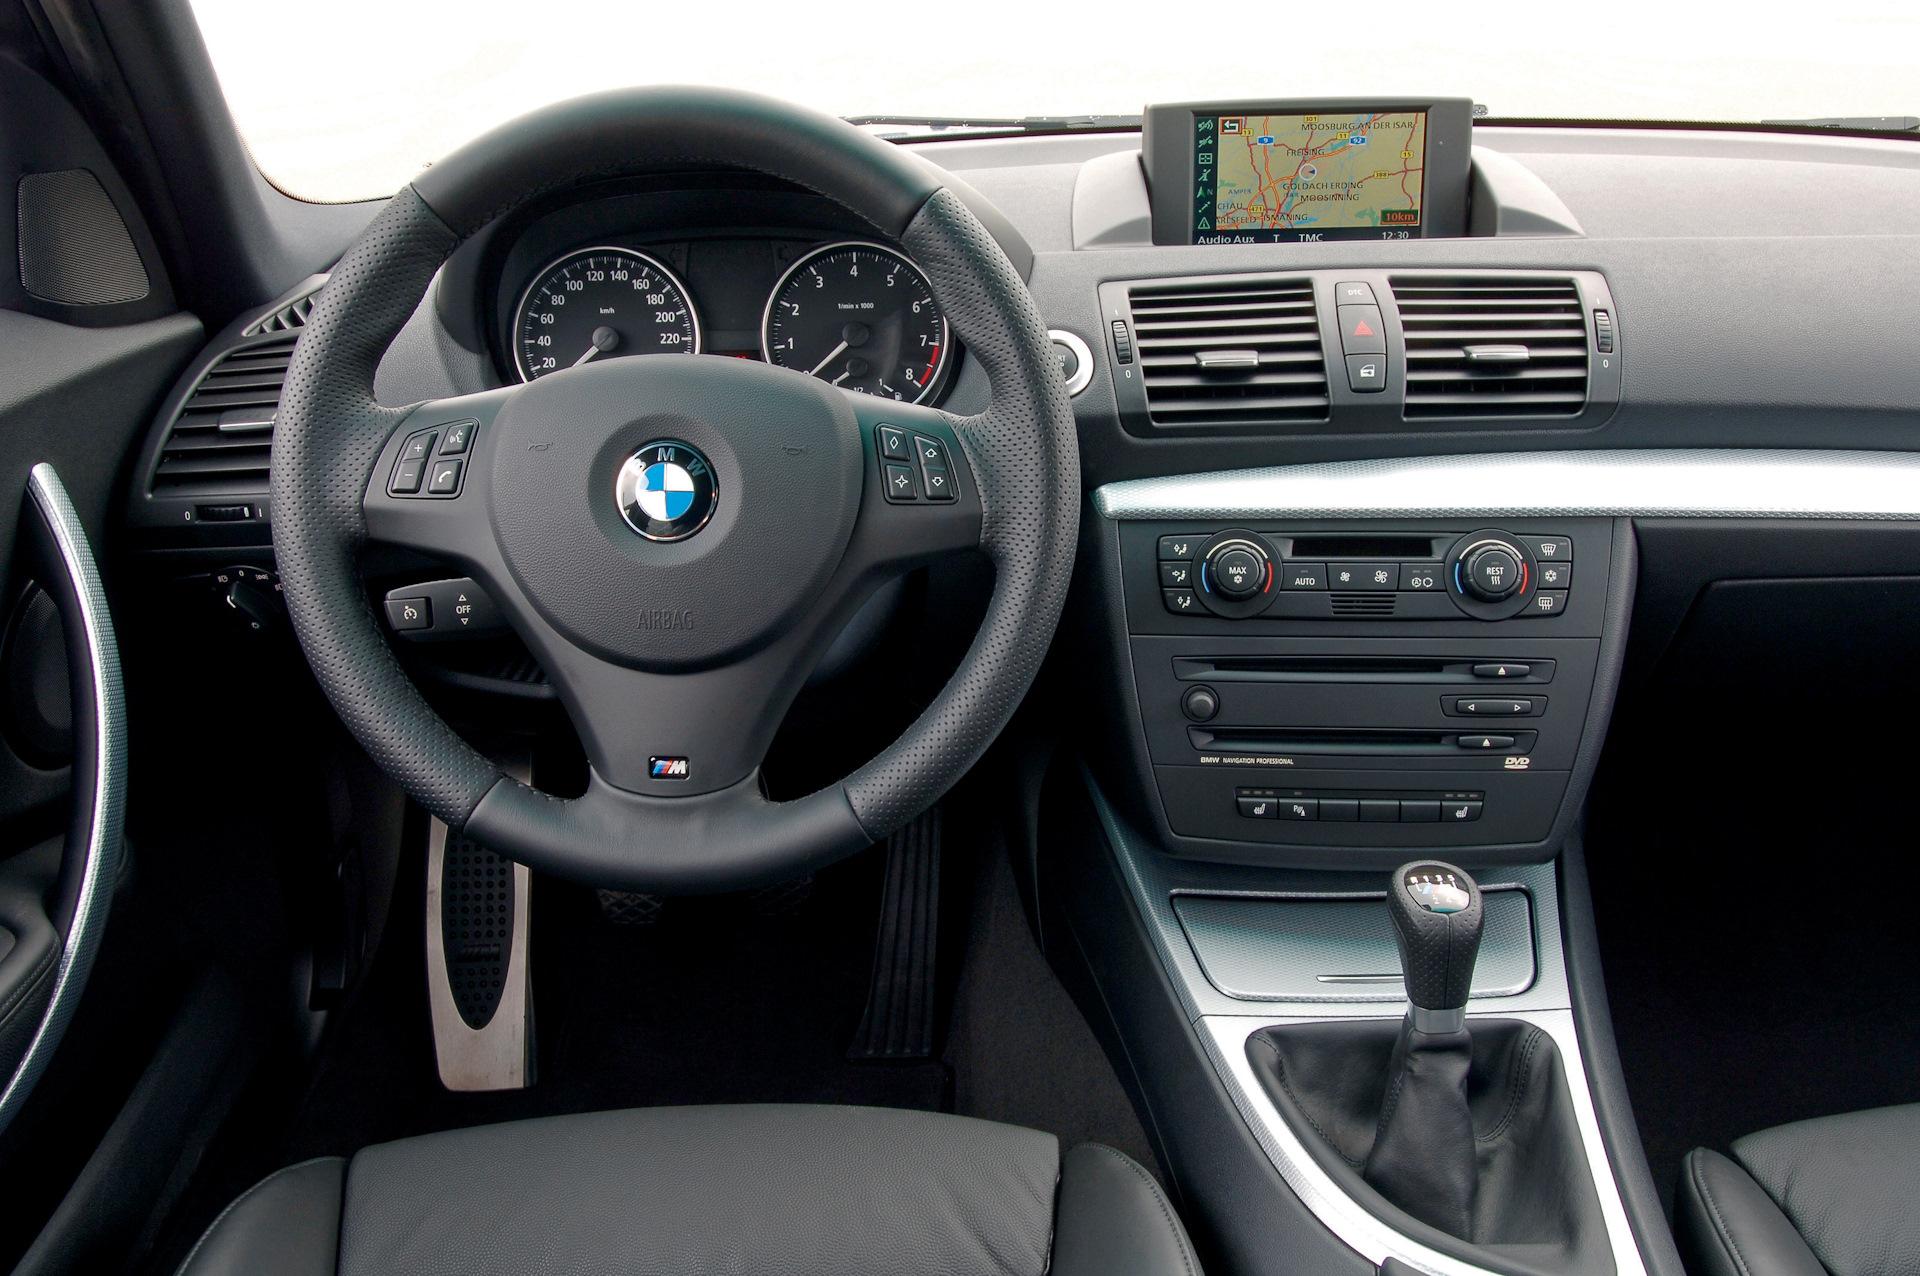 Как прочесть код ошибки на BMW 1-Series Е87